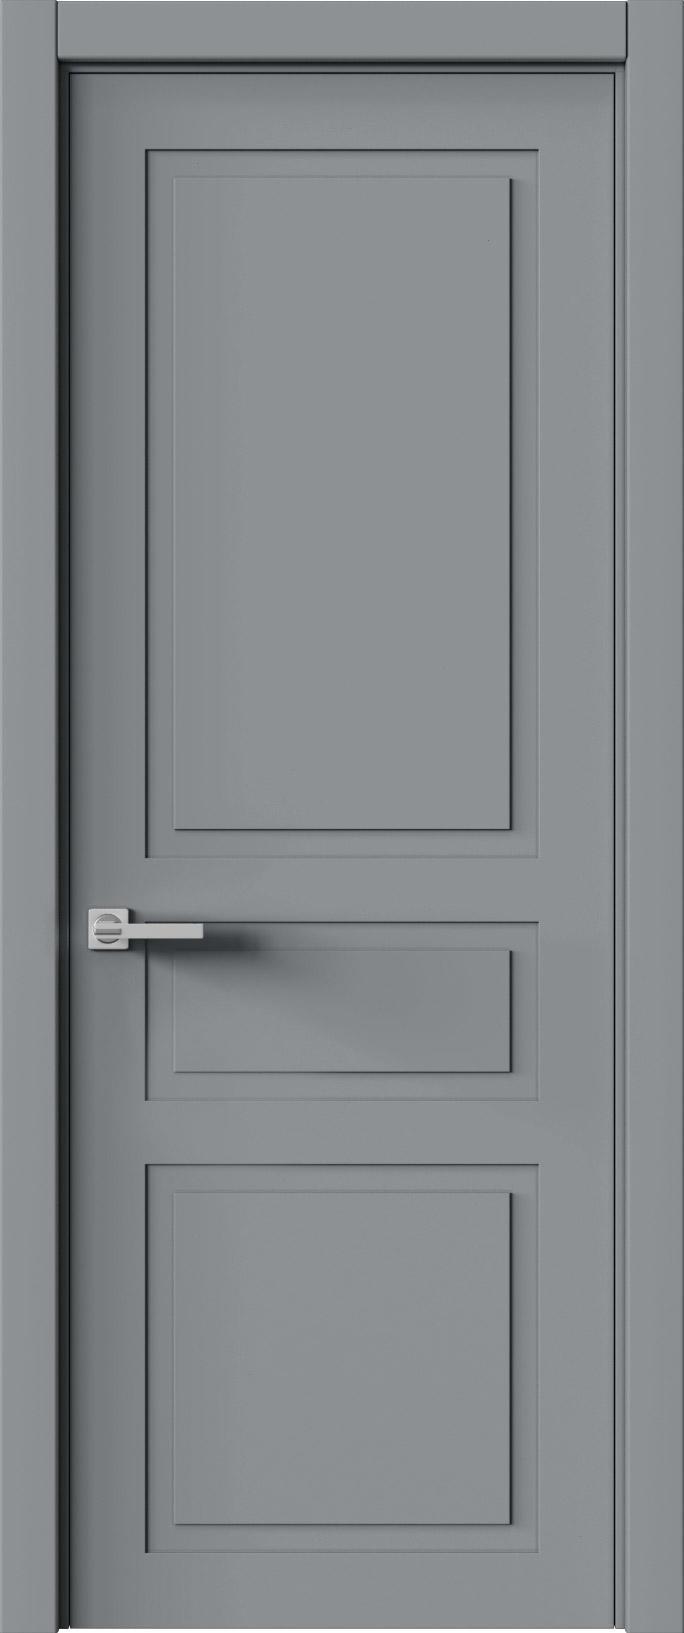 Tivoli Е-5 цвет - Серебристо-серая эмаль (RAL 7045) Без стекла (ДГ)